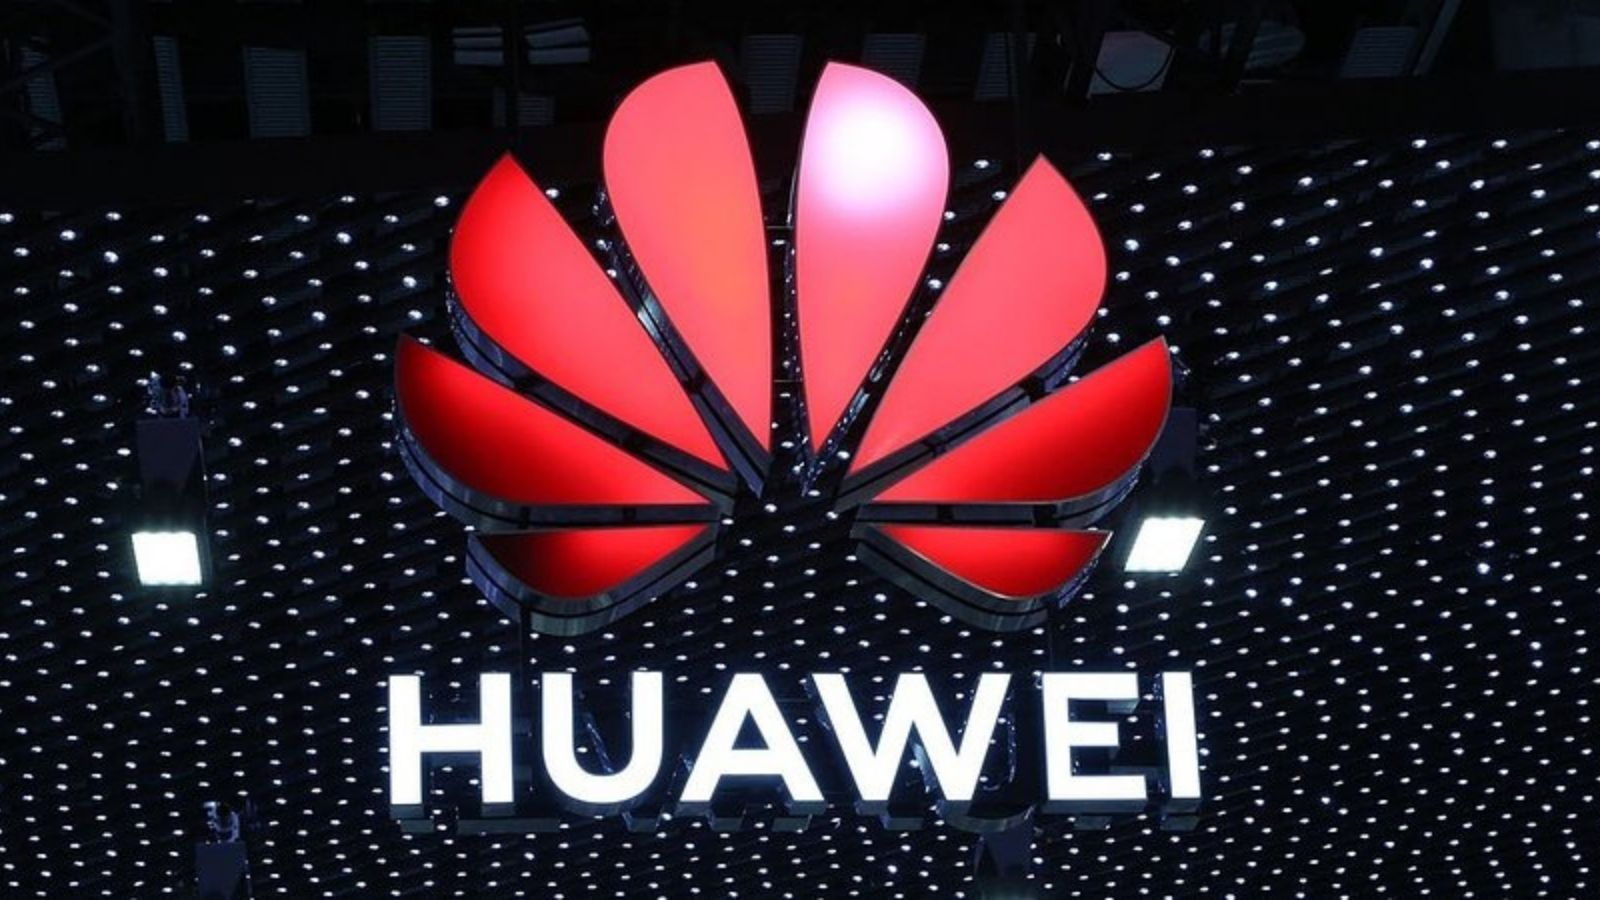 Huawei uruchamia własną platformę reklamową Huawei mediarun huawei